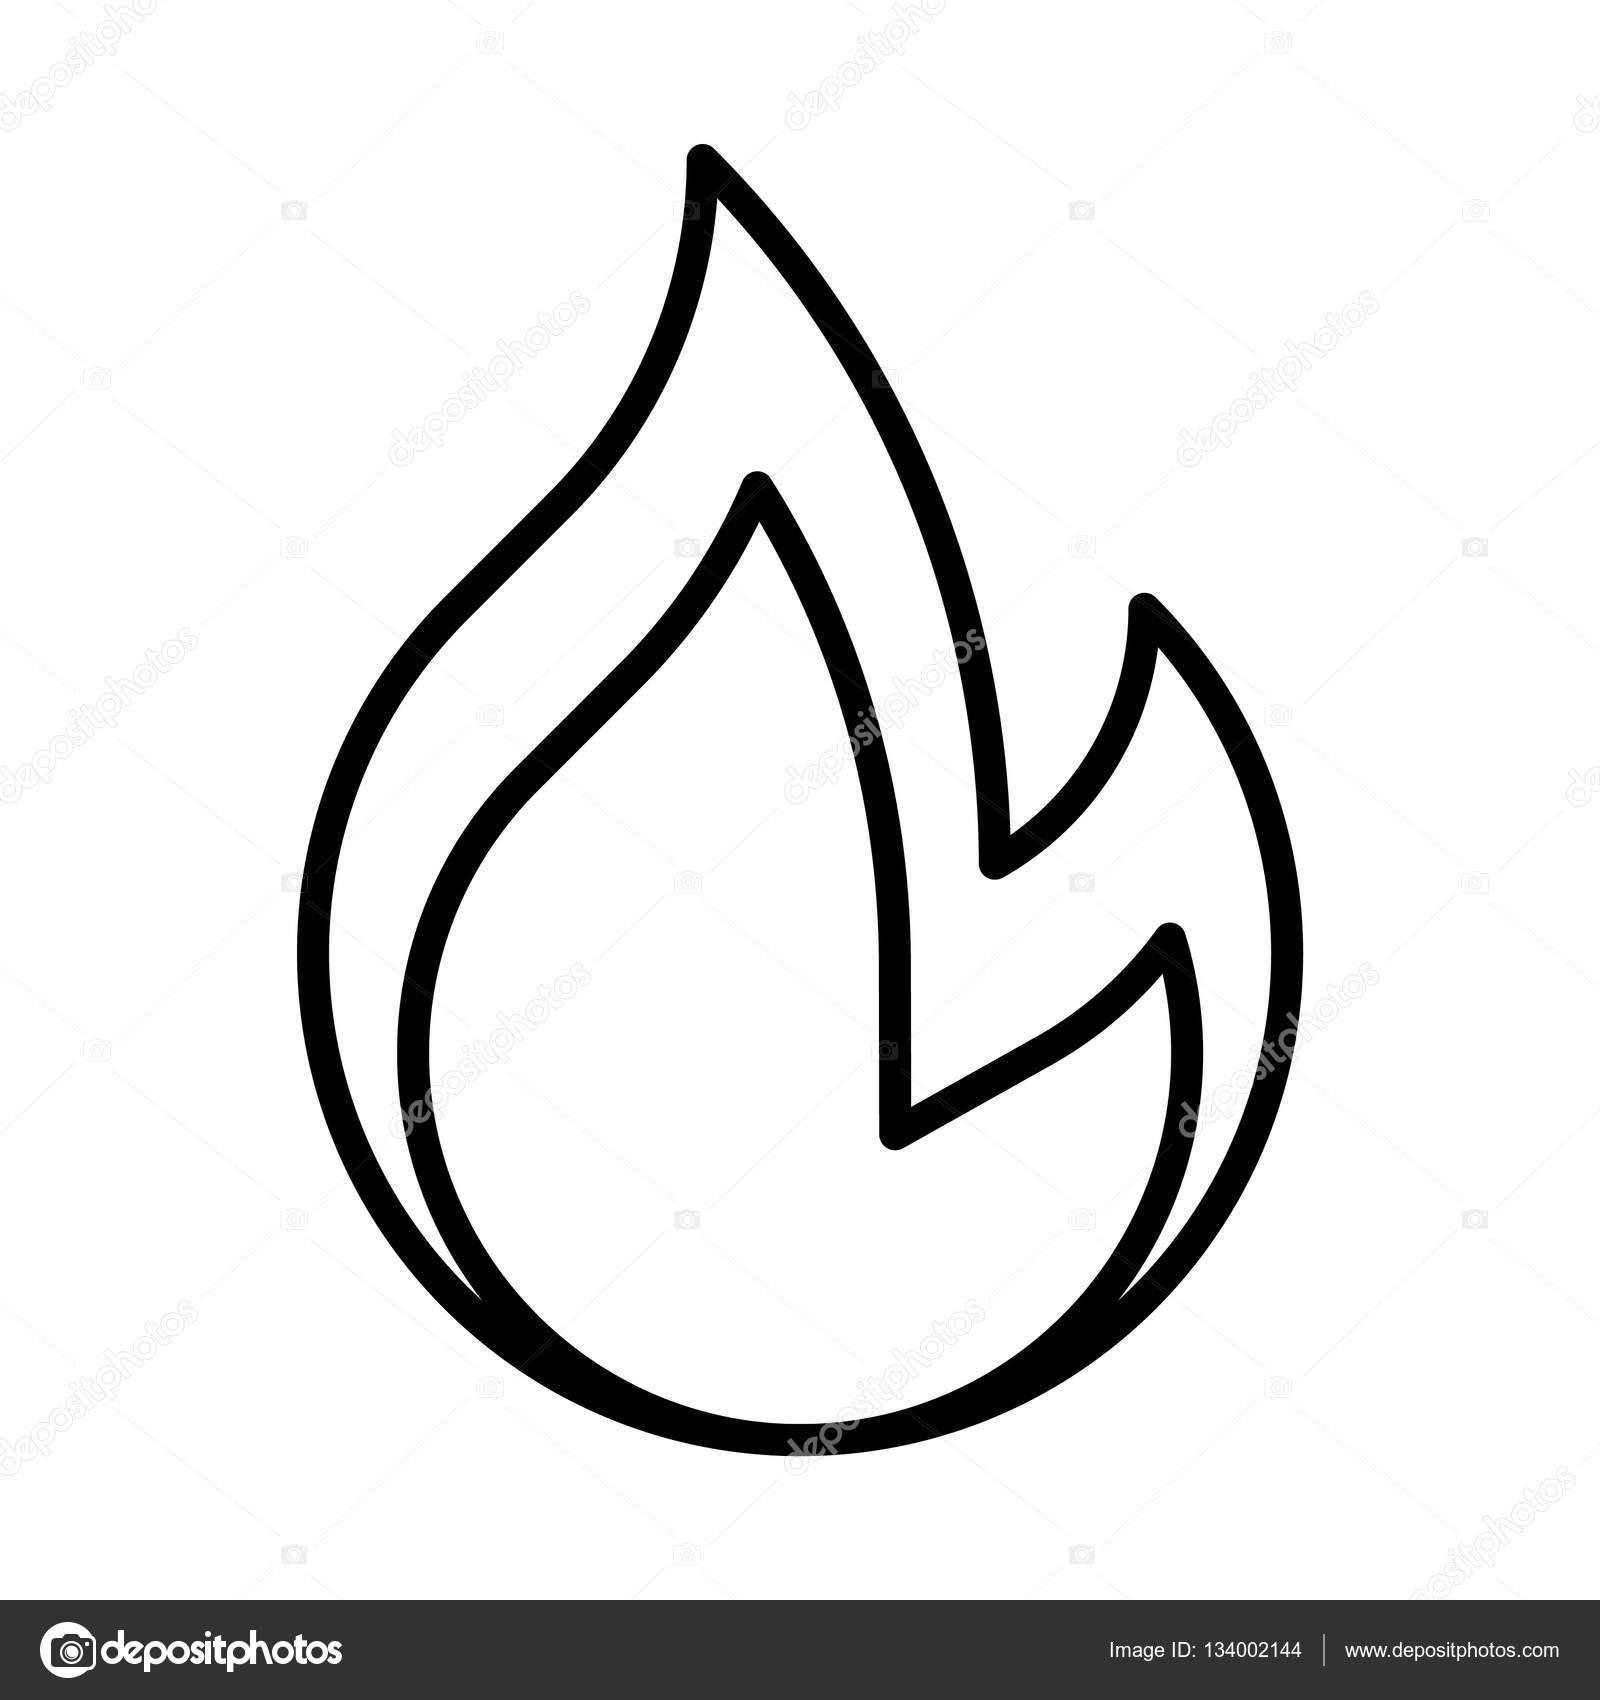 Simple Flame Drawing At Getdrawings